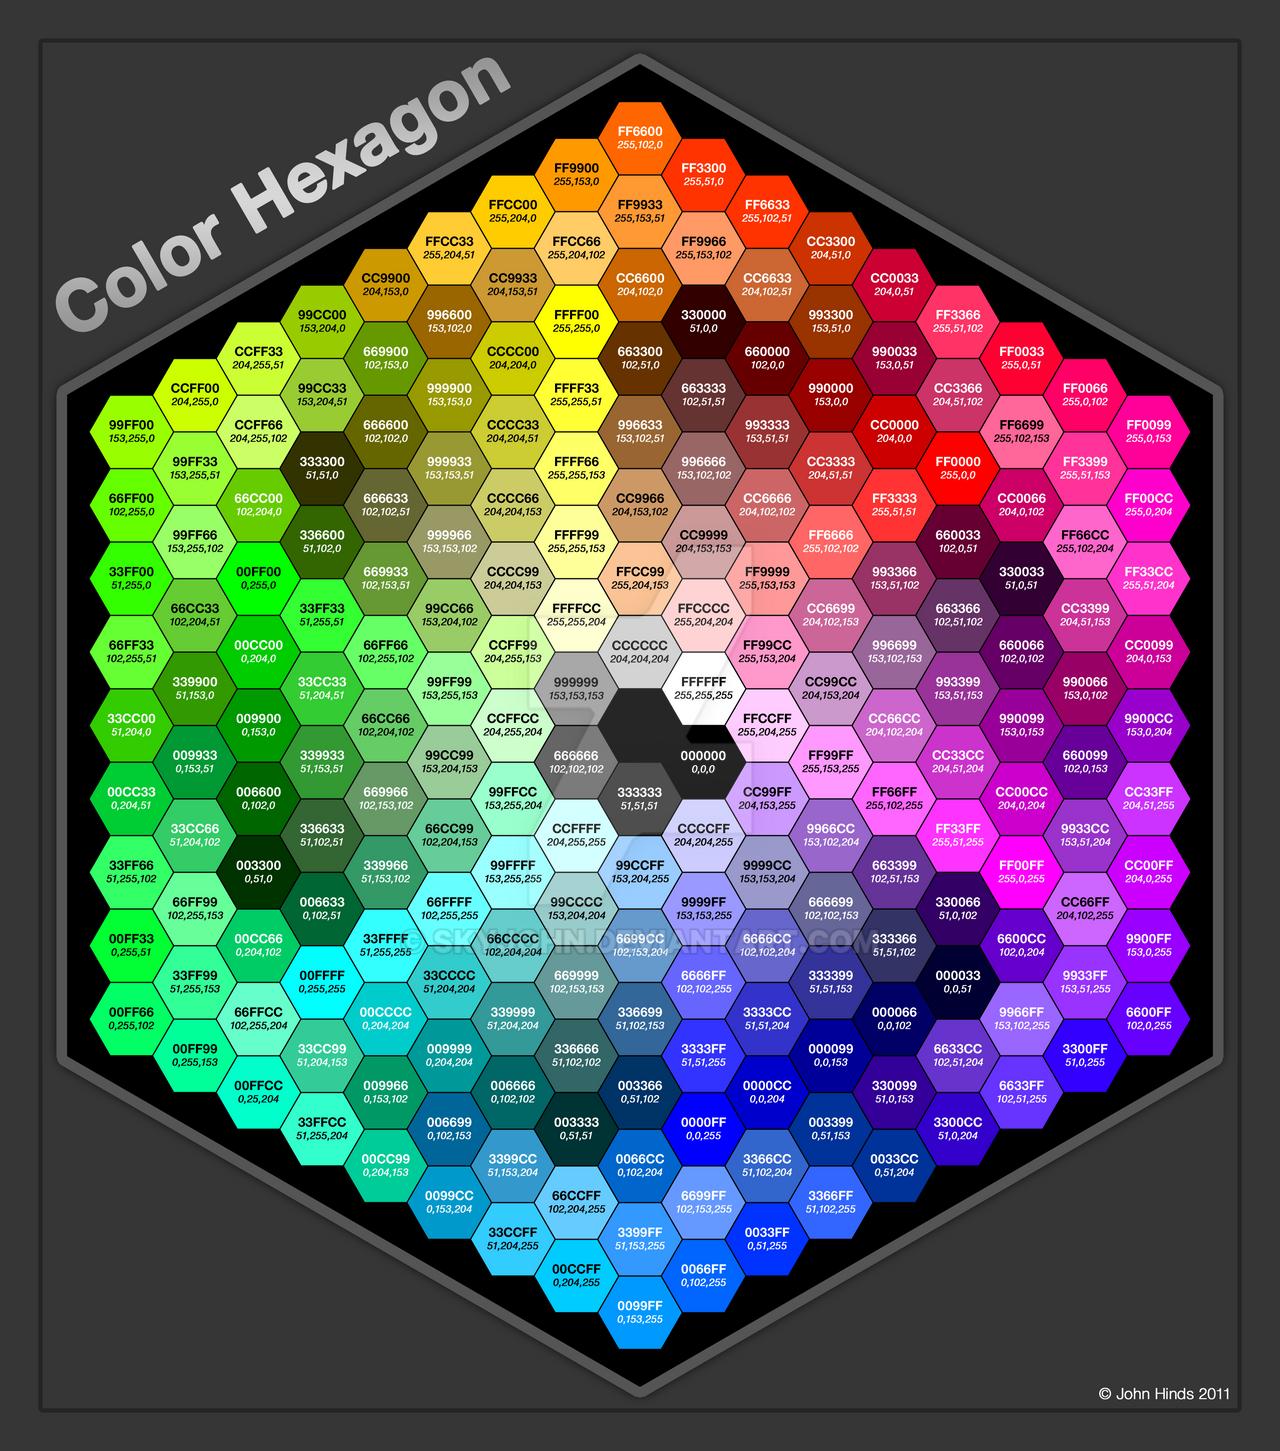 Hexagon color chart by skyjohn on deviantart hexagon color chart by skyjohn hexagon color chart by skyjohn nvjuhfo Image collections